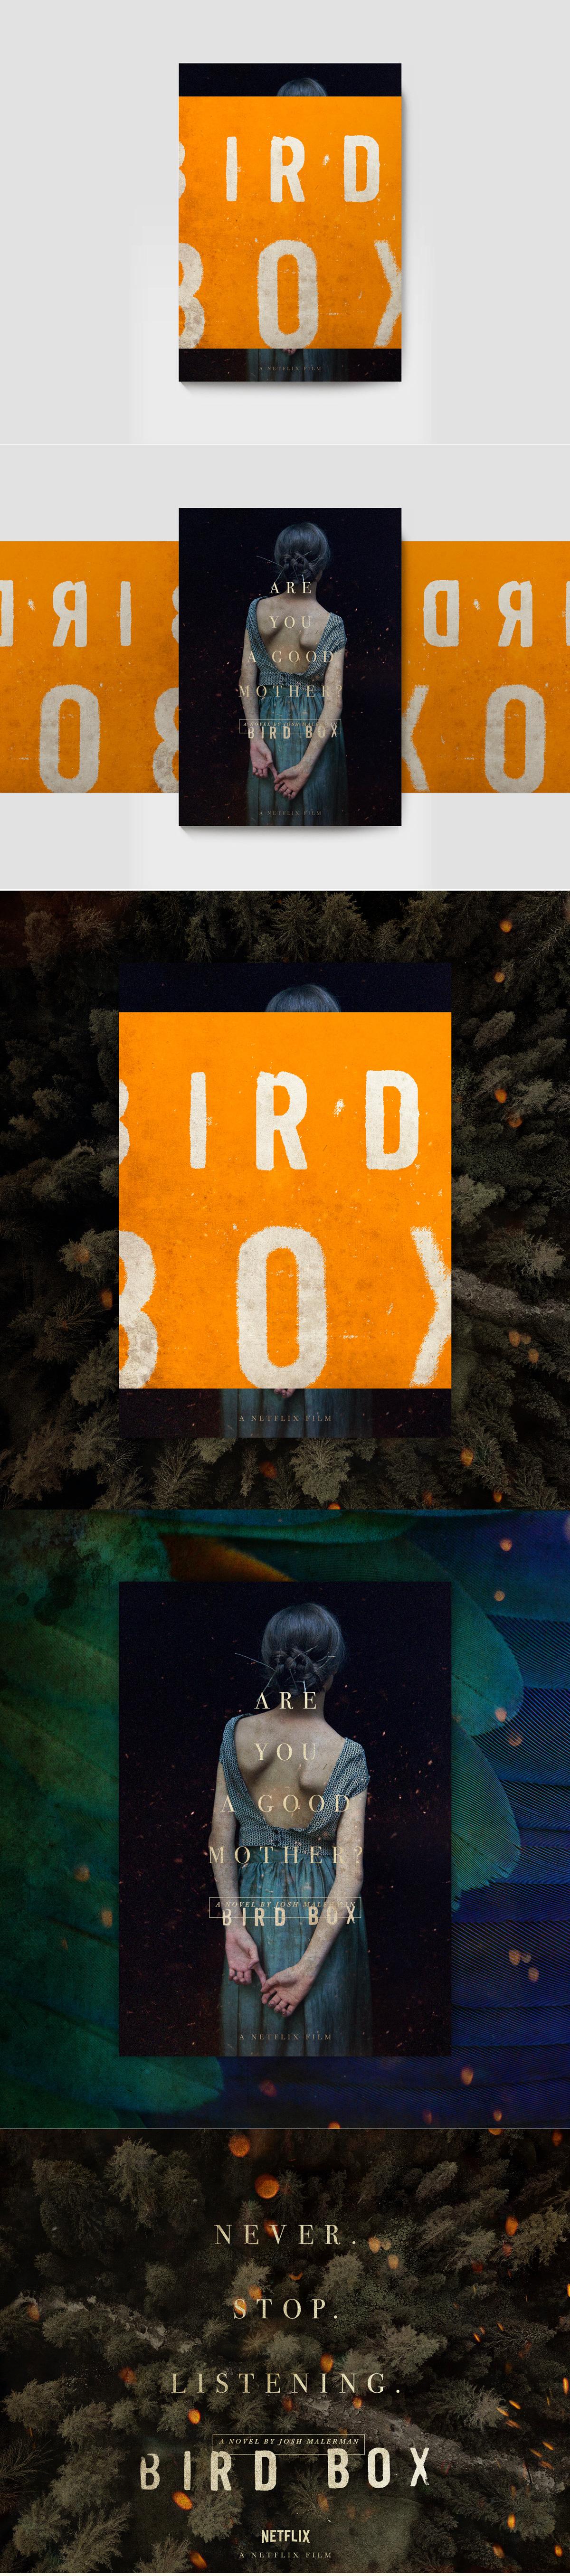 Birdbox Blindfold Book01 Layout By Paul Drohan Dribbble Dribbble